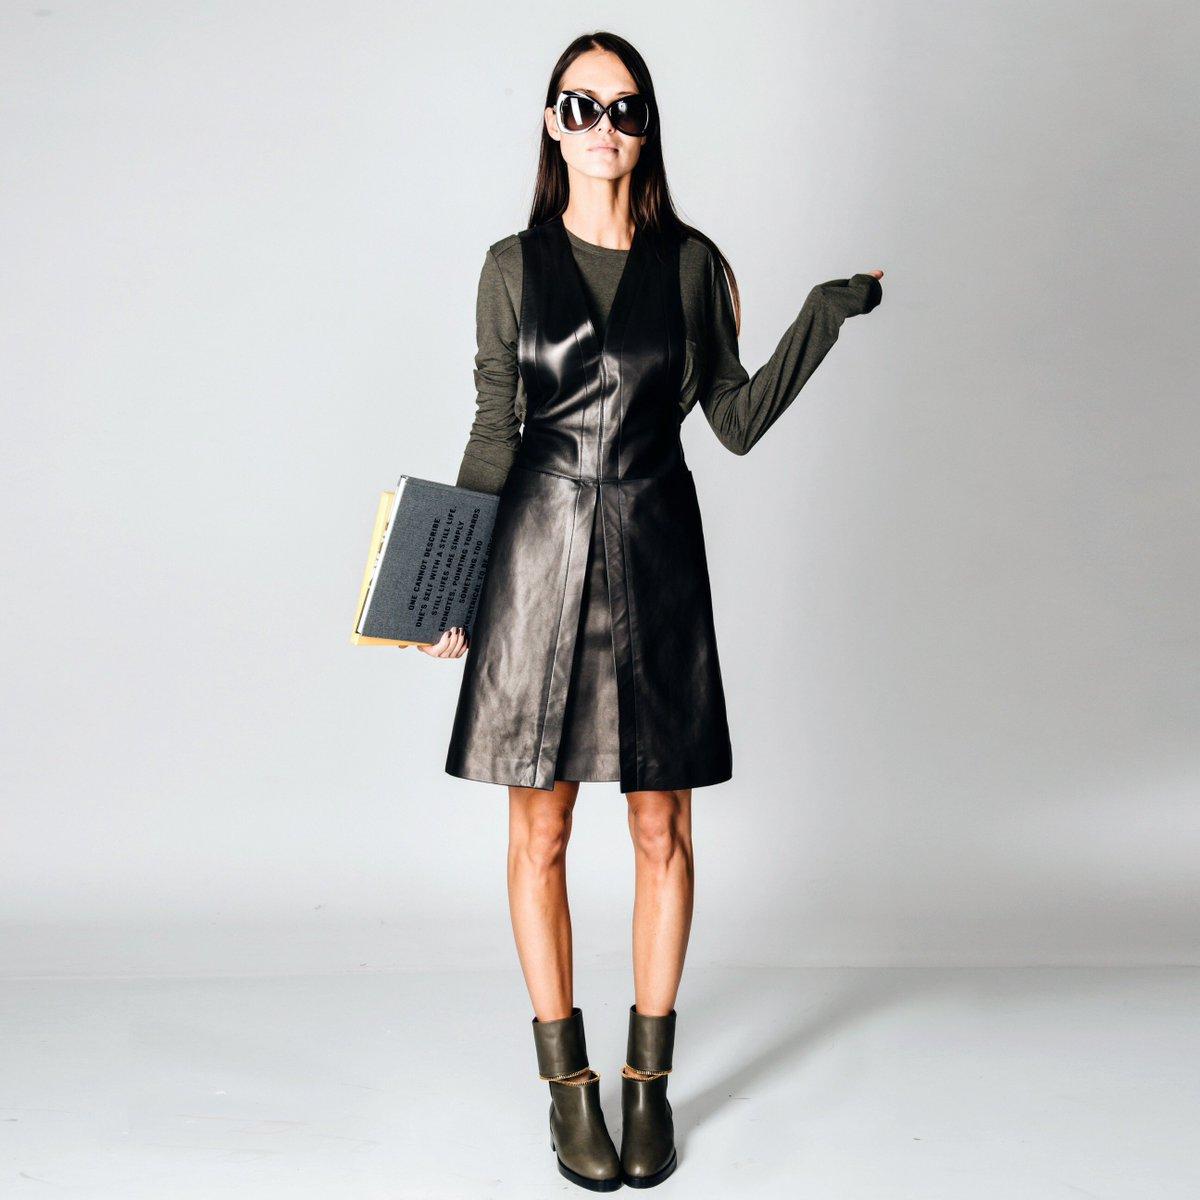 Smart Casual. Кожаное платье @azzedinealaiaofficial, пуловер @alexanderwangny, ботинки @pierrehardy, очки @tomford. https://t.co/YCHNVhTbGK